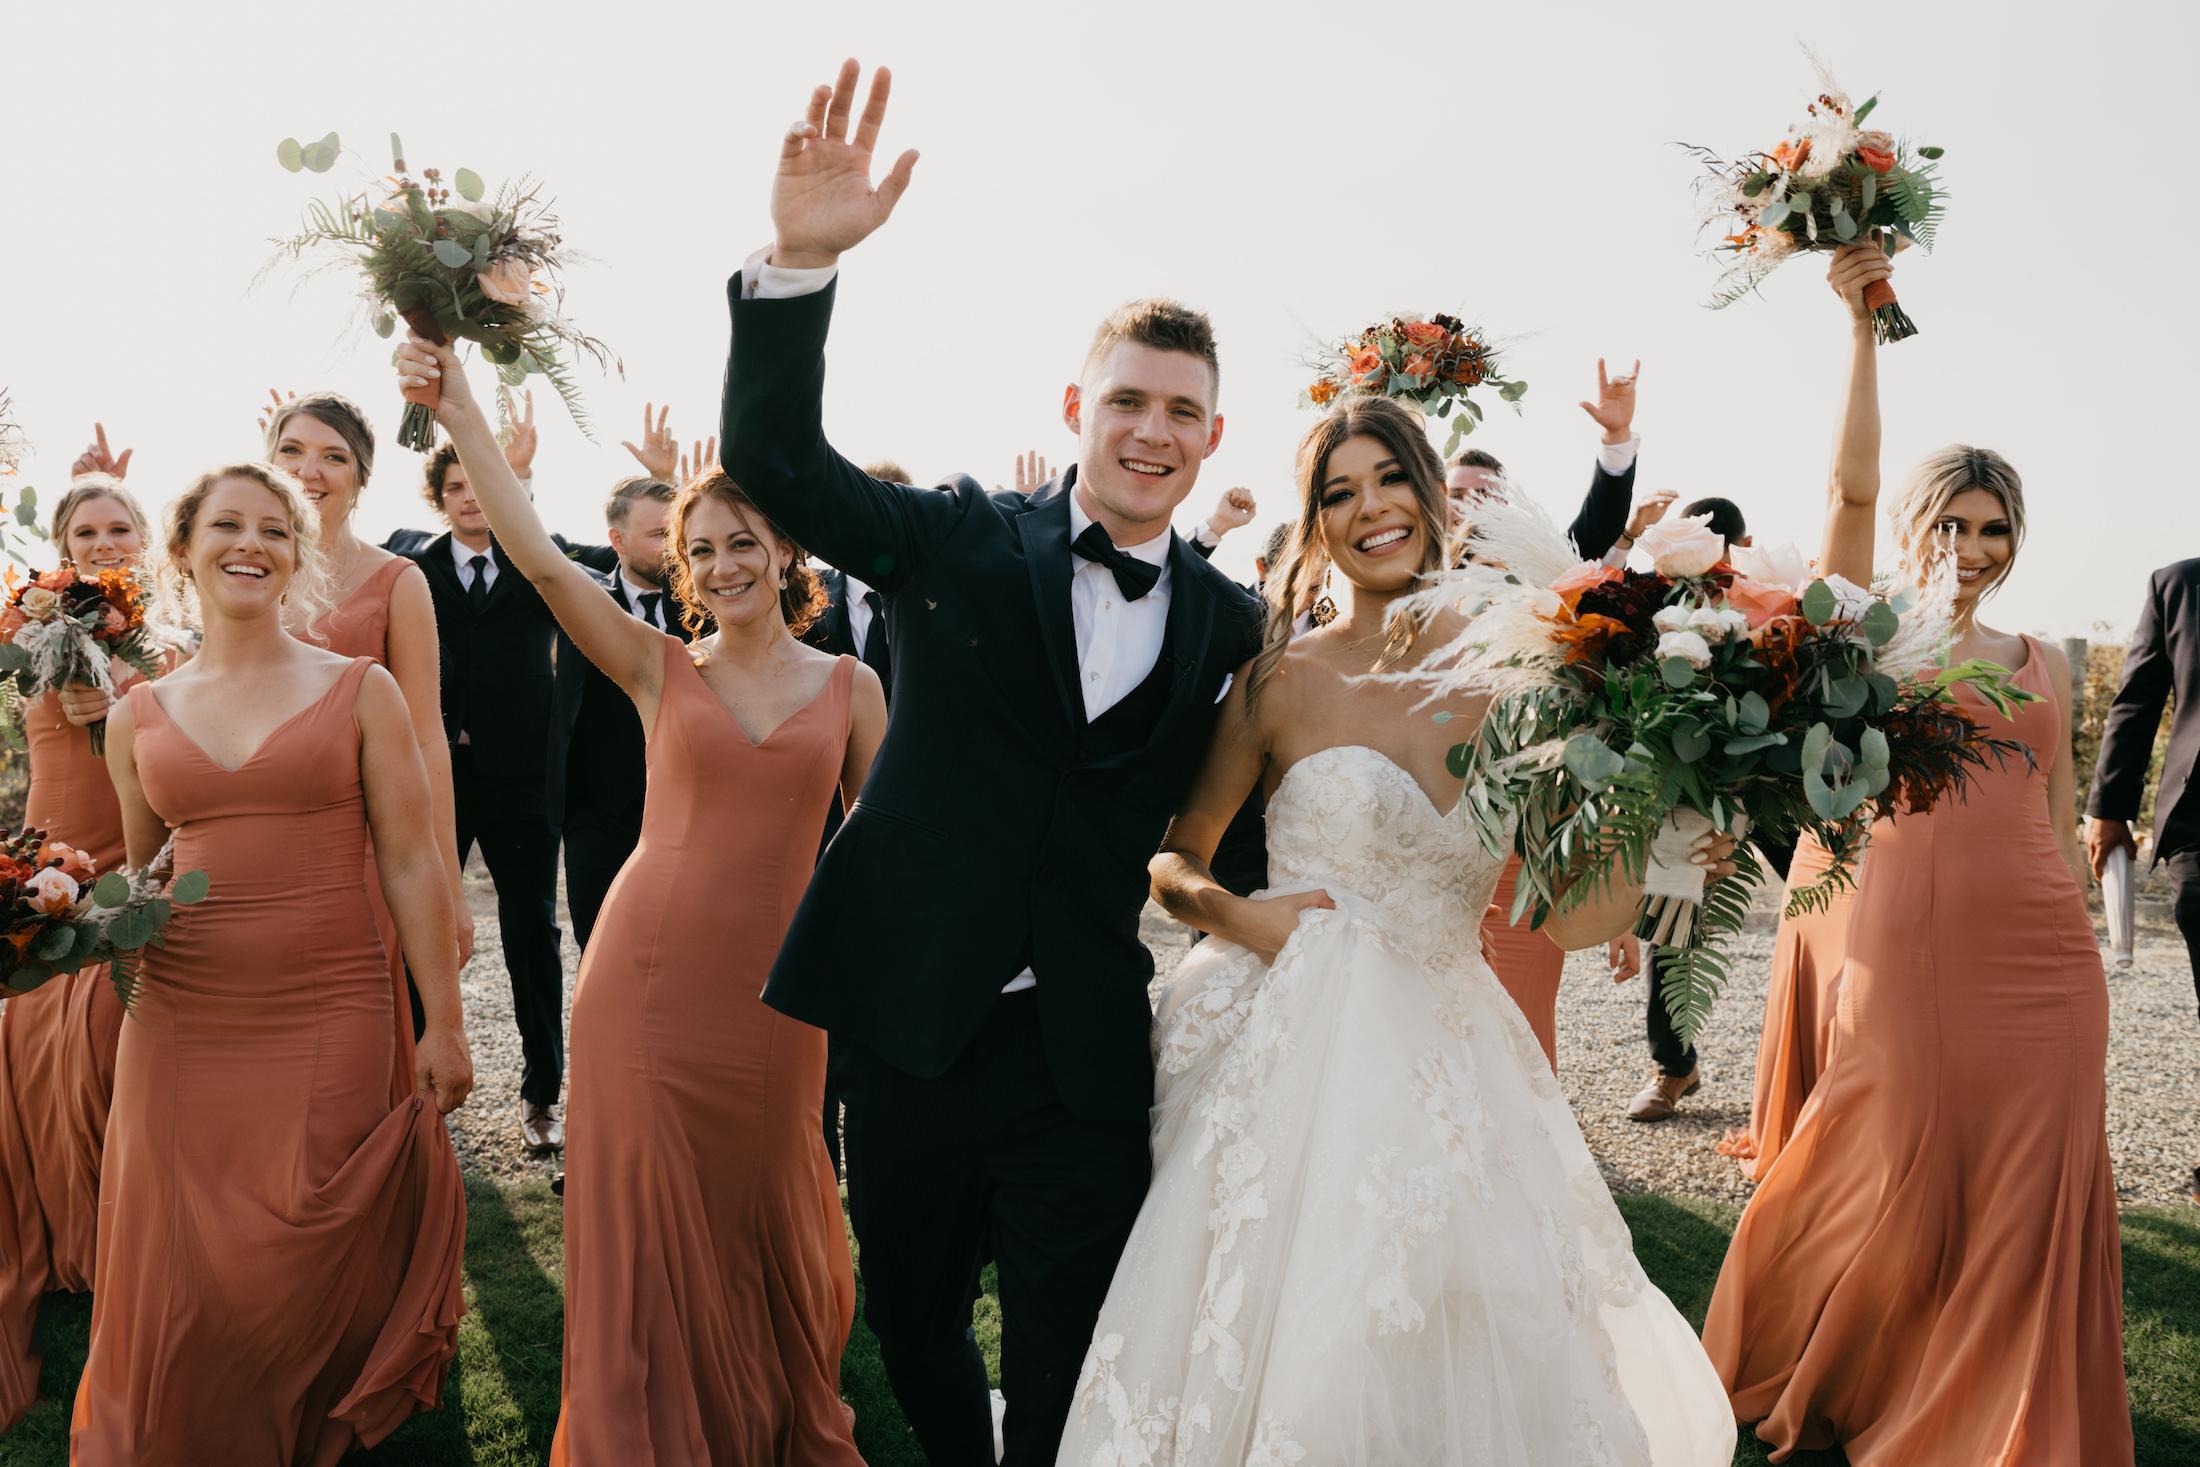 Bridal Party fun shot, image by Fatima Elreda Photo